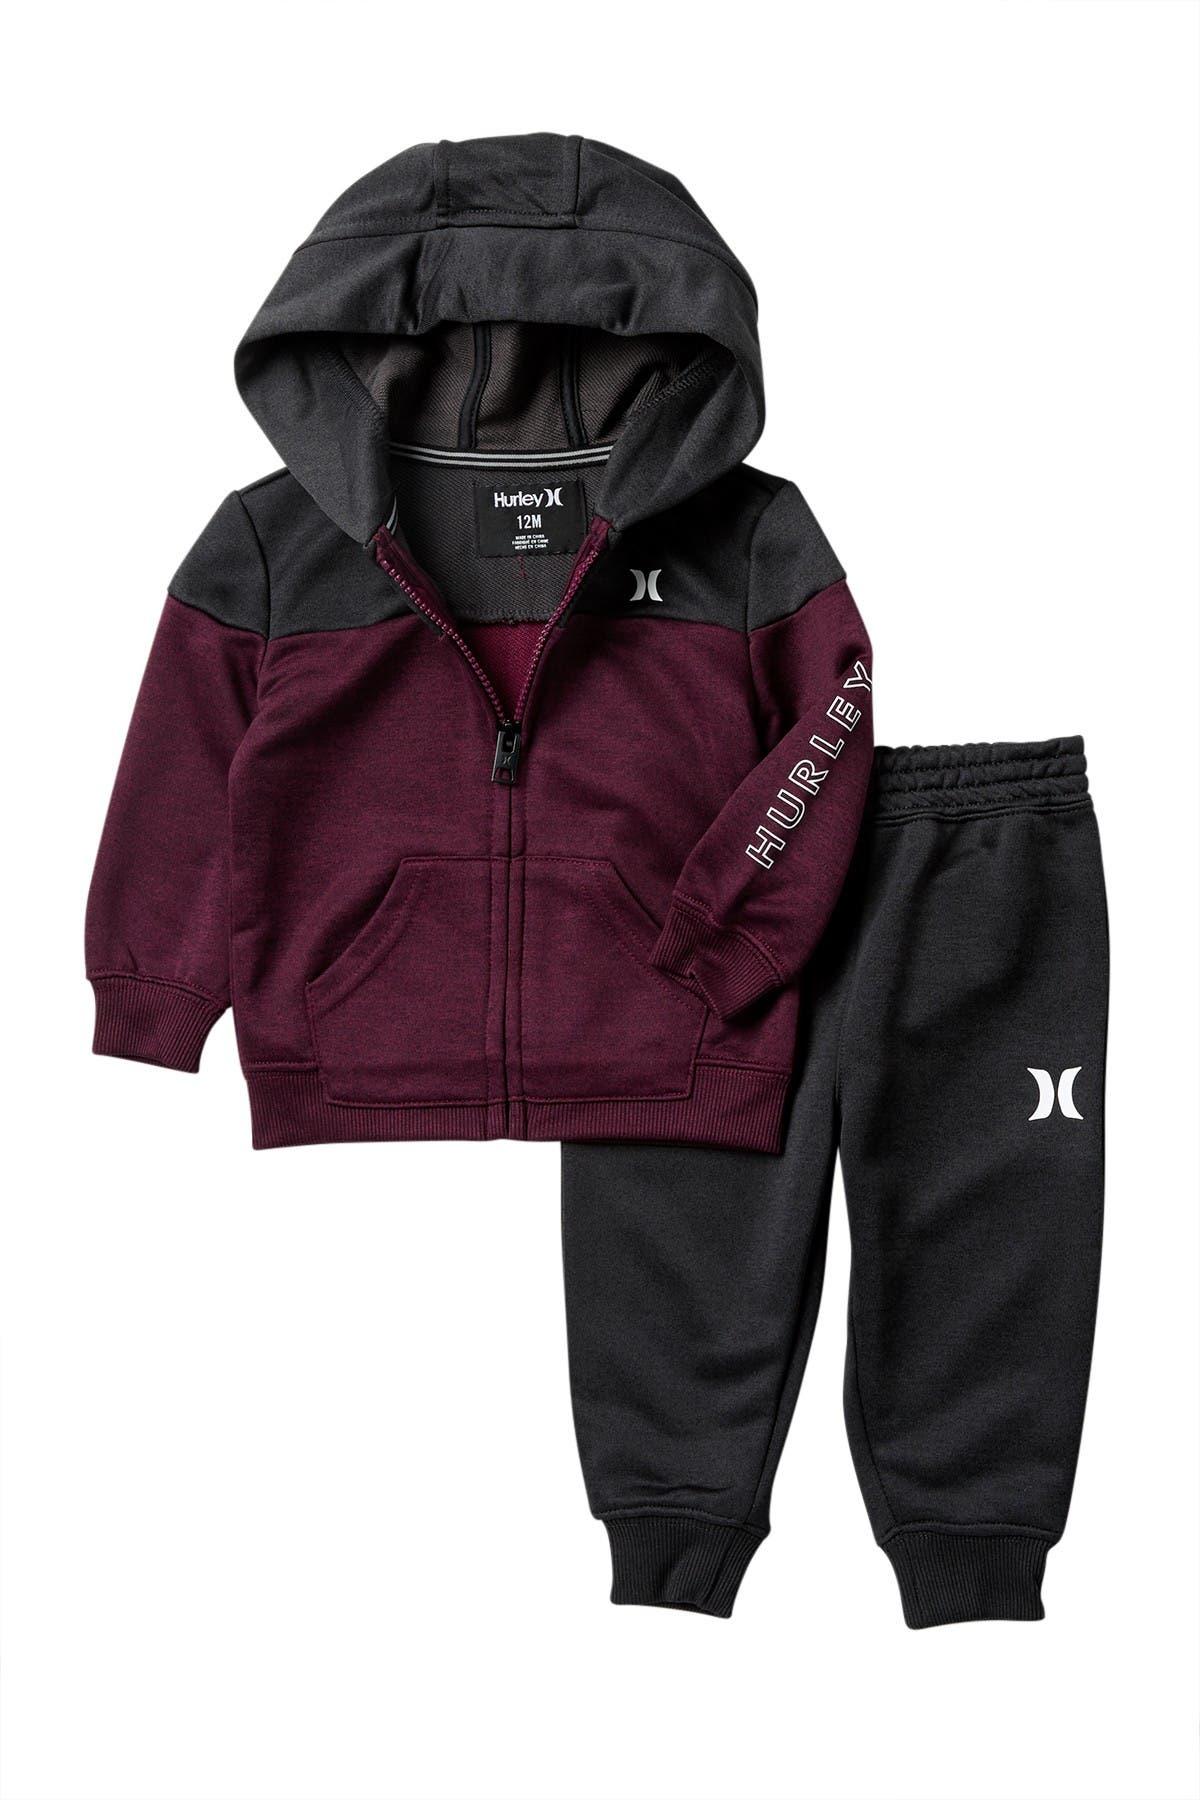 Image of Hurley Solar Jacket & Pants 2-Piece Set